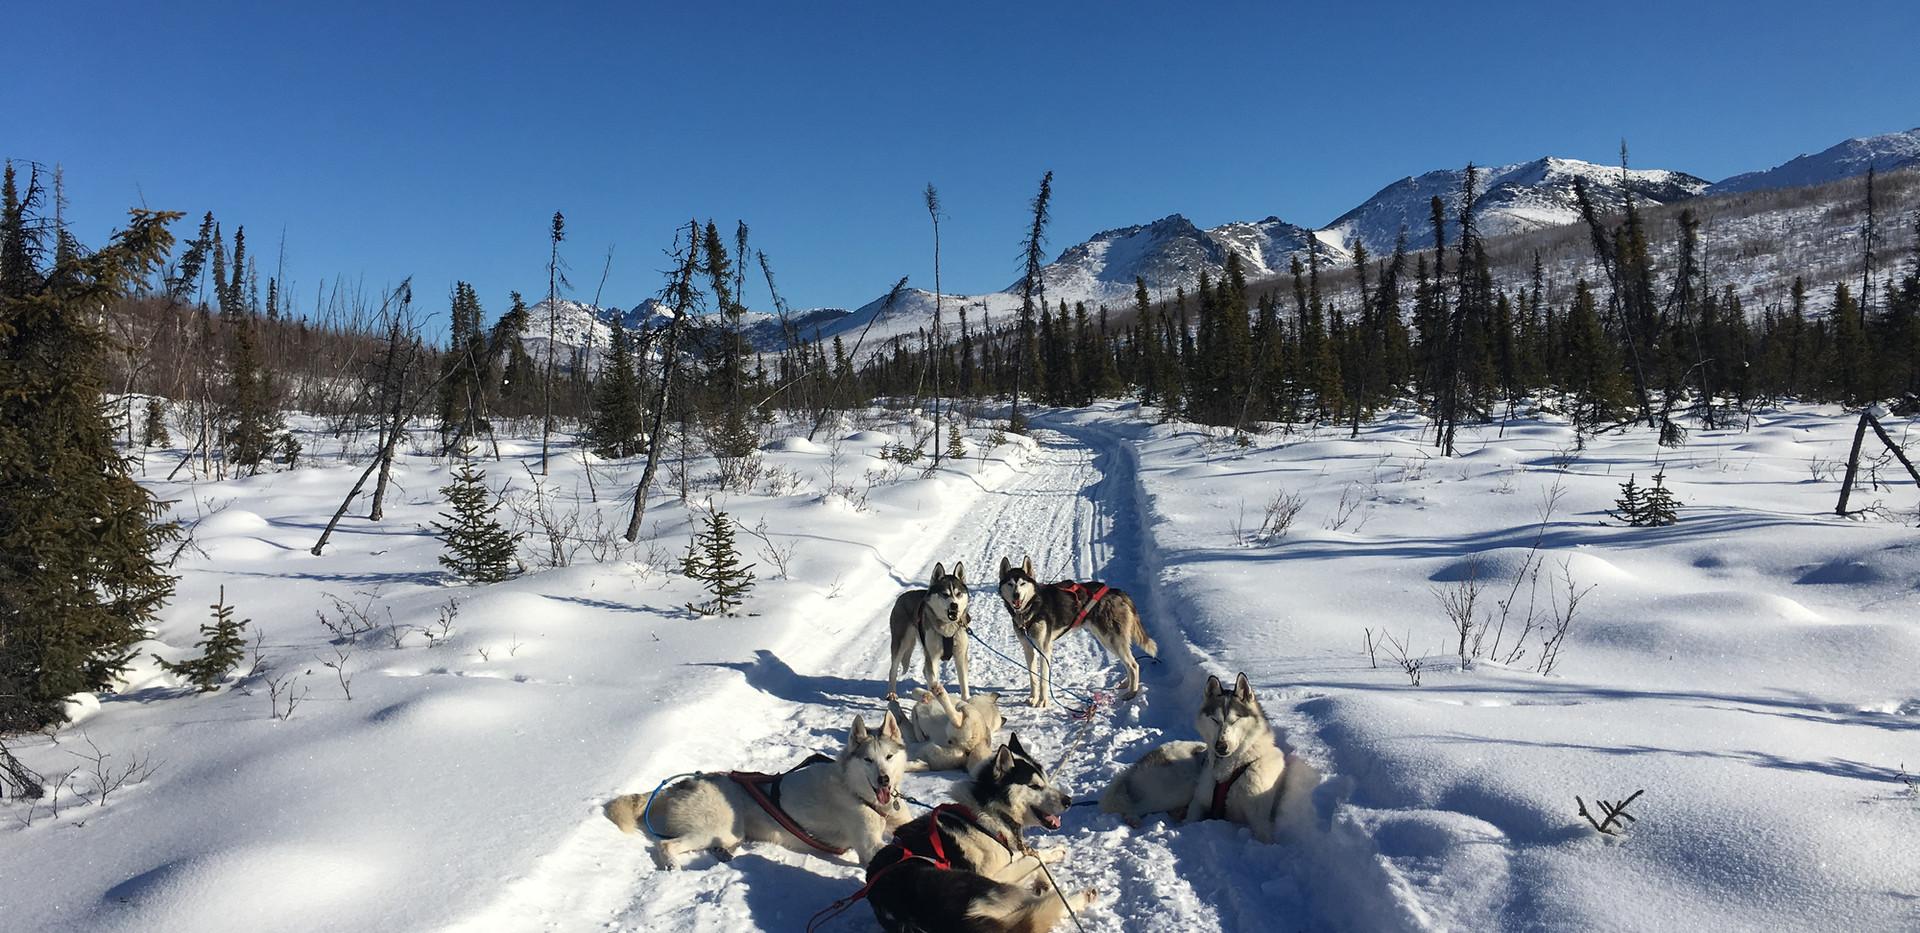 Lunch break just past Wolf Run Cabin.